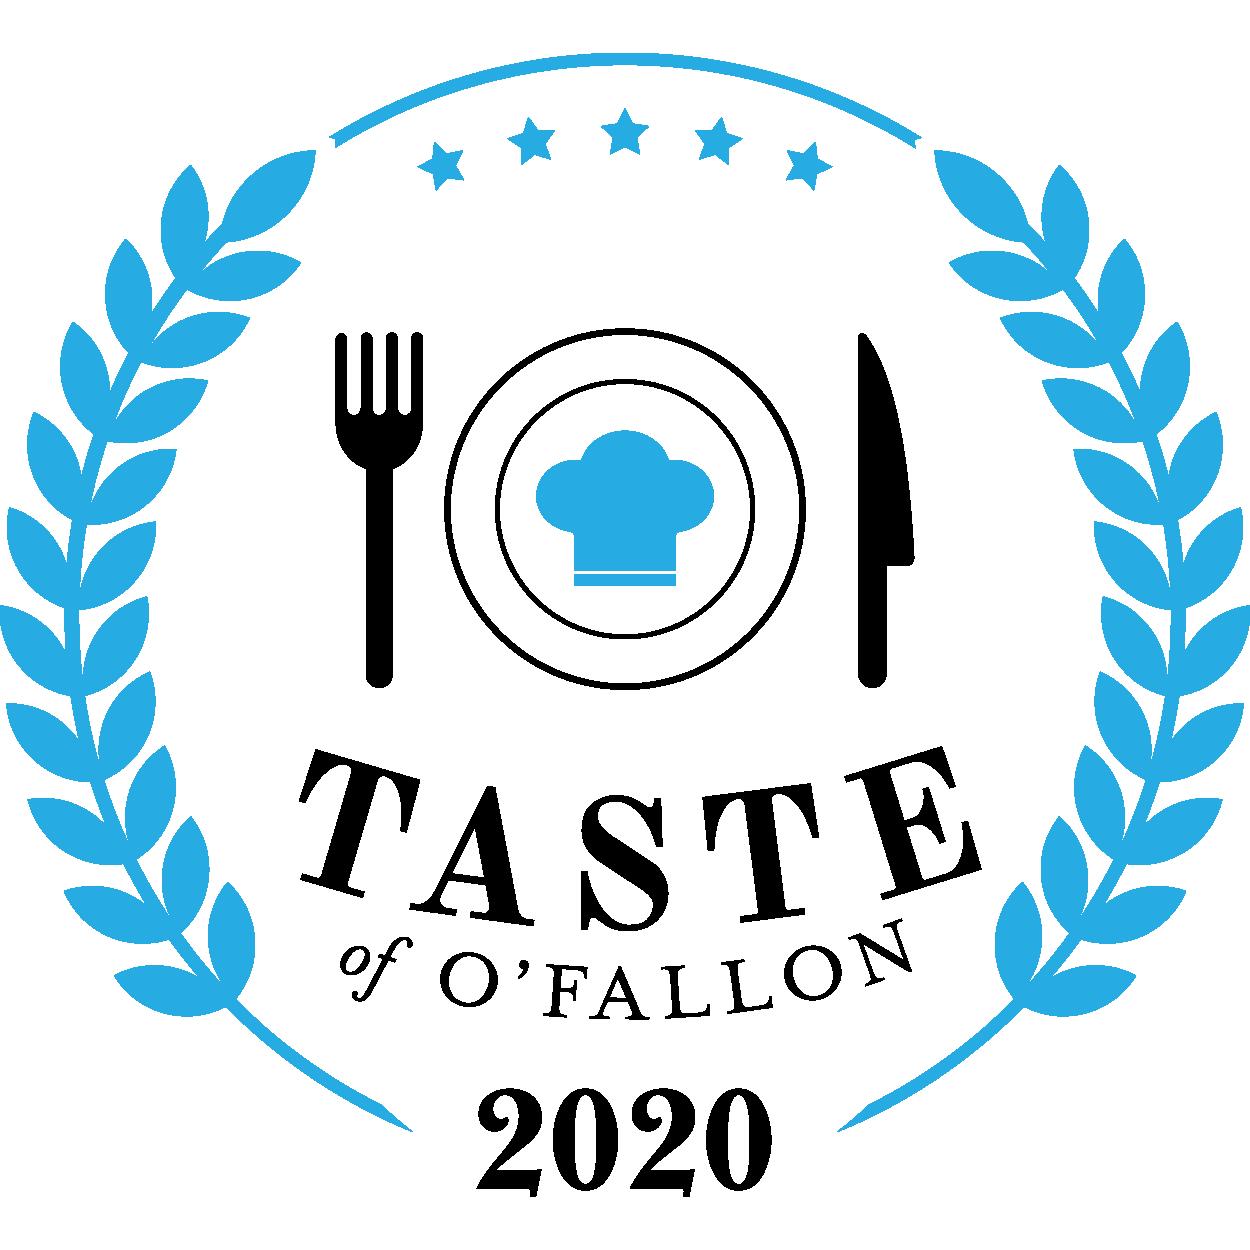 TasteOfallon-logo-01